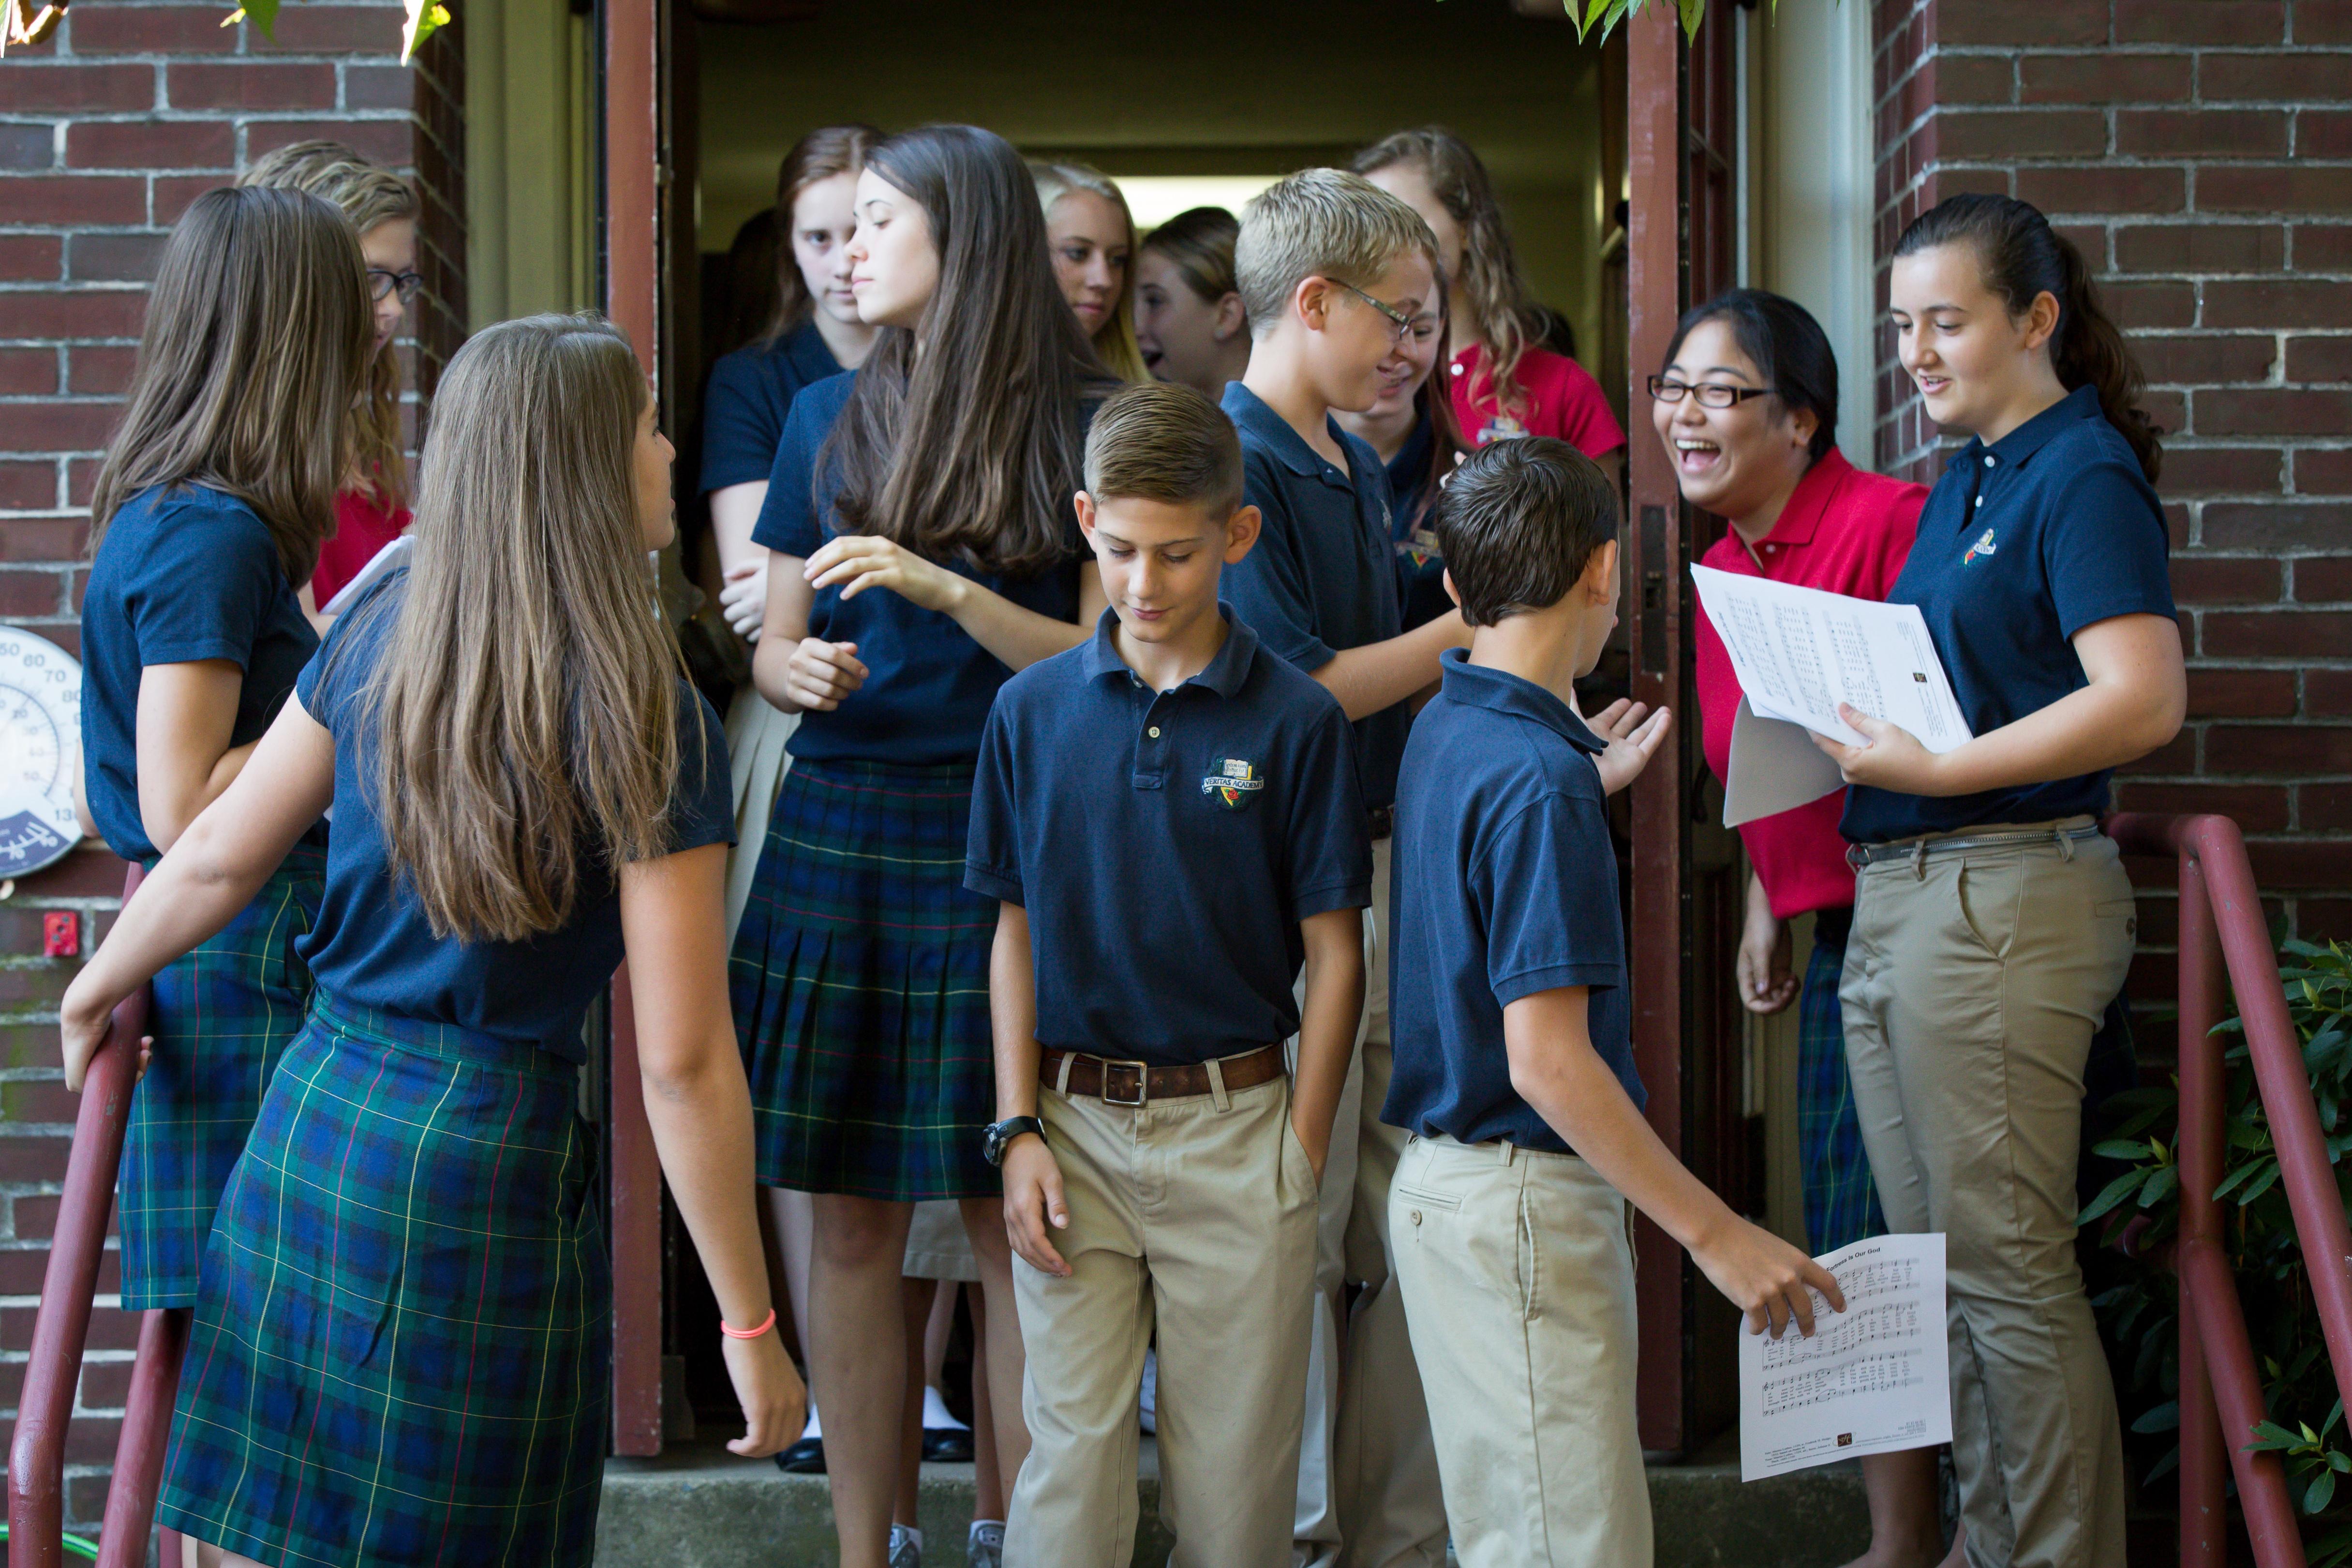 veritas students | Veritas Academy | Classical Christian School